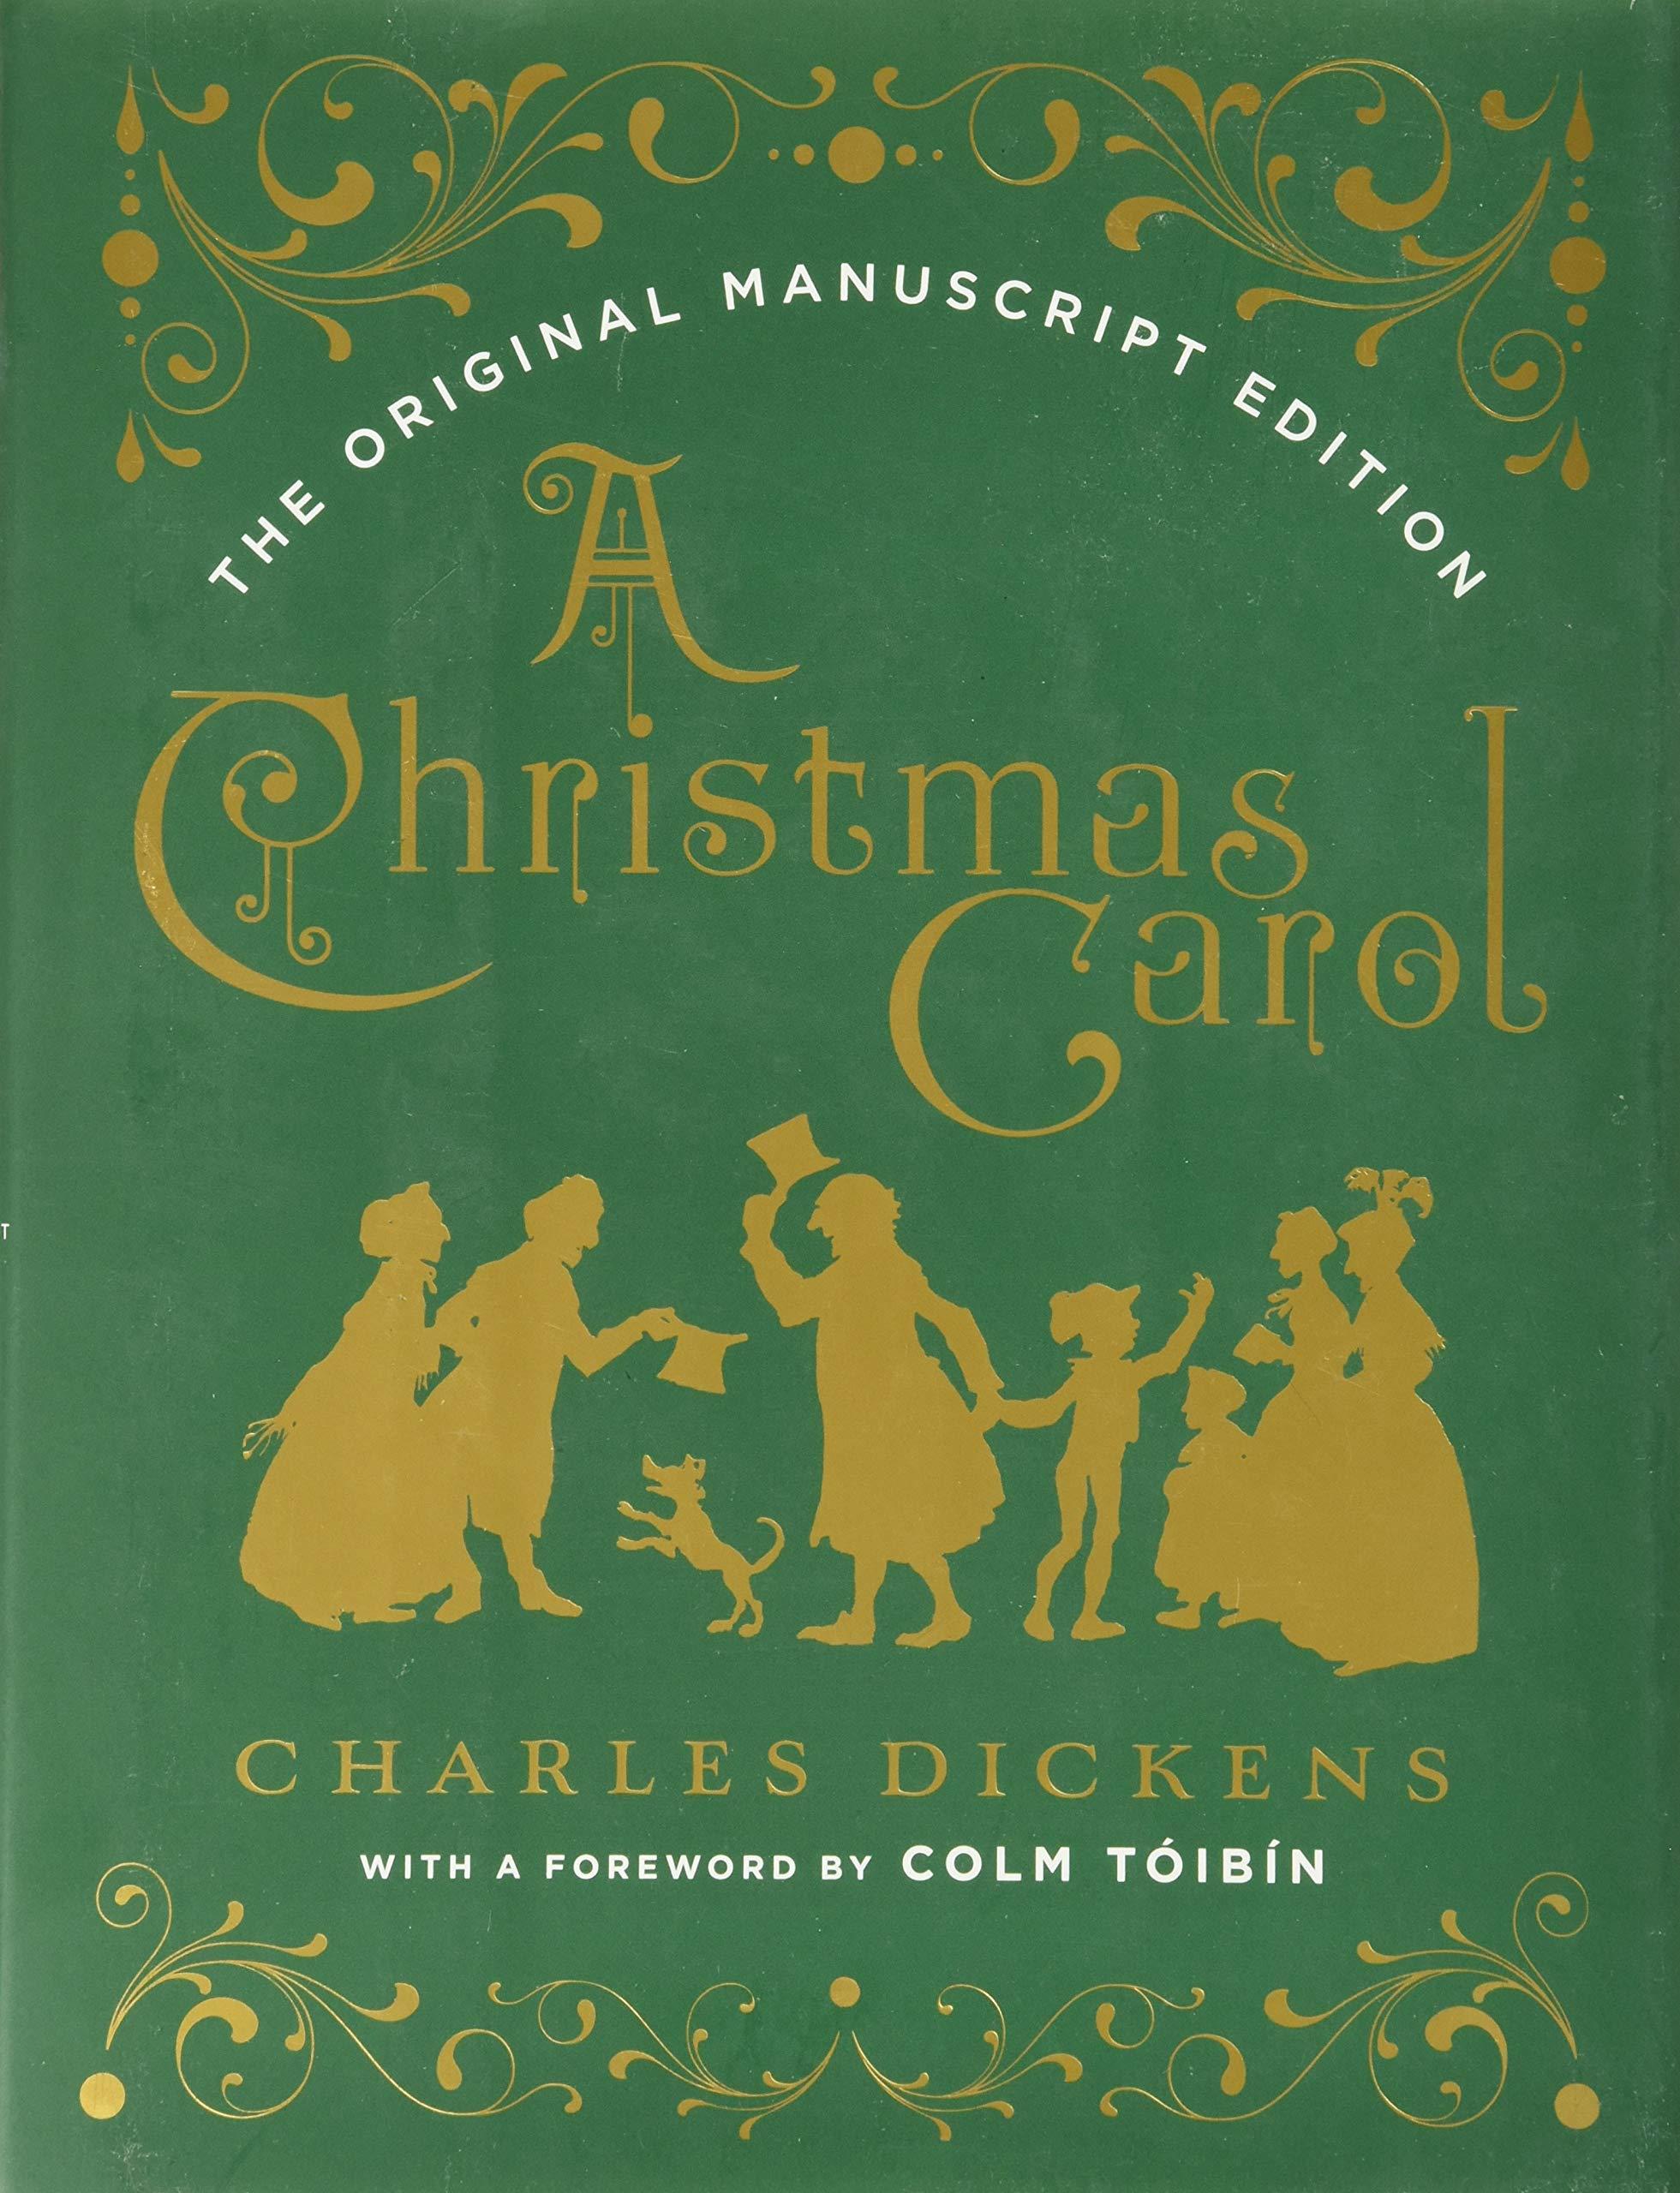 Amazon Com A Christmas Carol The Original Manuscript Edition 9780393608649 Dickens Charles Toibin Colm Books